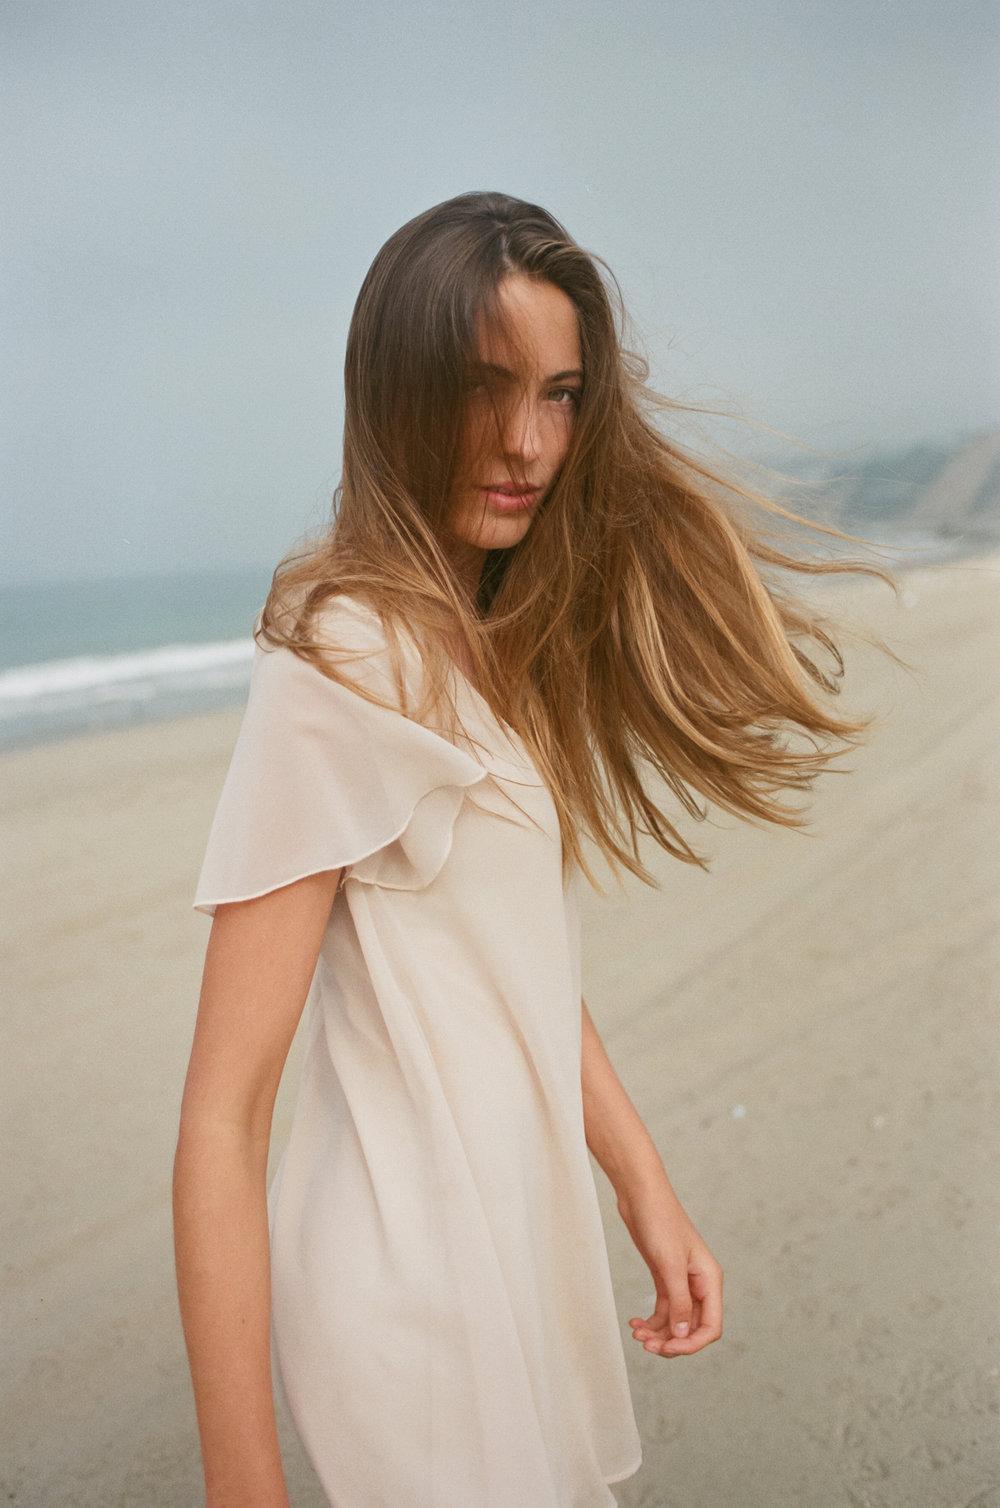 Aliya-Ware-by-Jacqueline-Puwalski-3.jpg